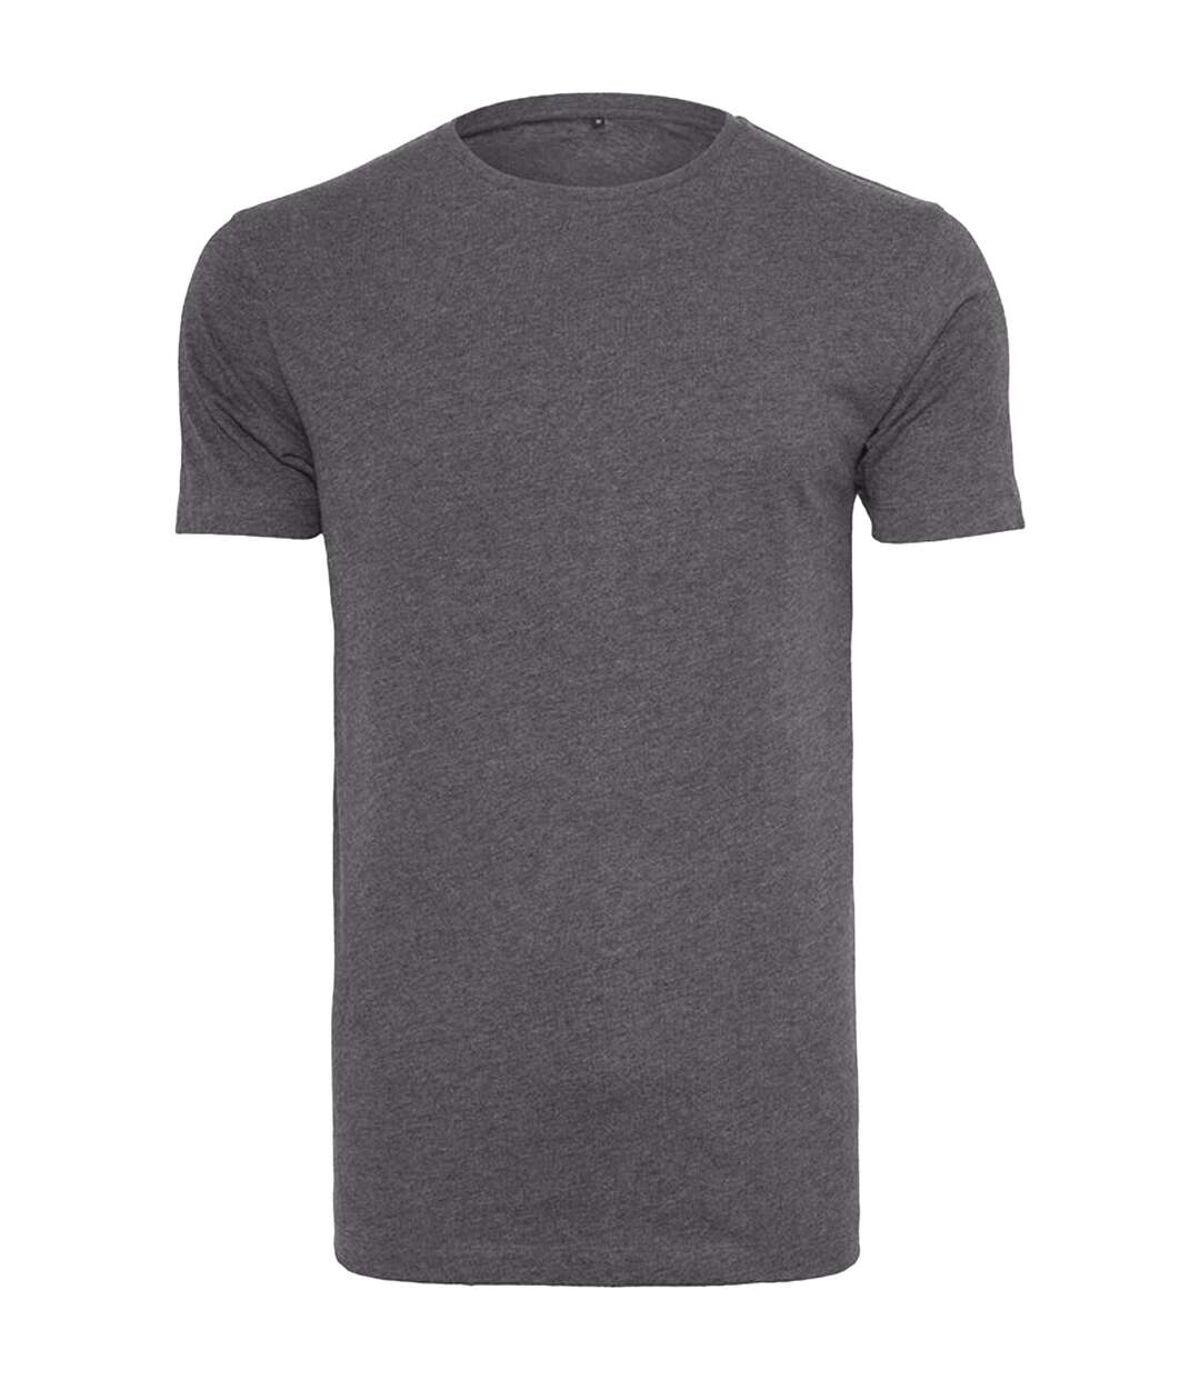 Build Your Brand Mens Light Round Neck Short Sleeve T-Shirt (Charcoal) - UTRW5684